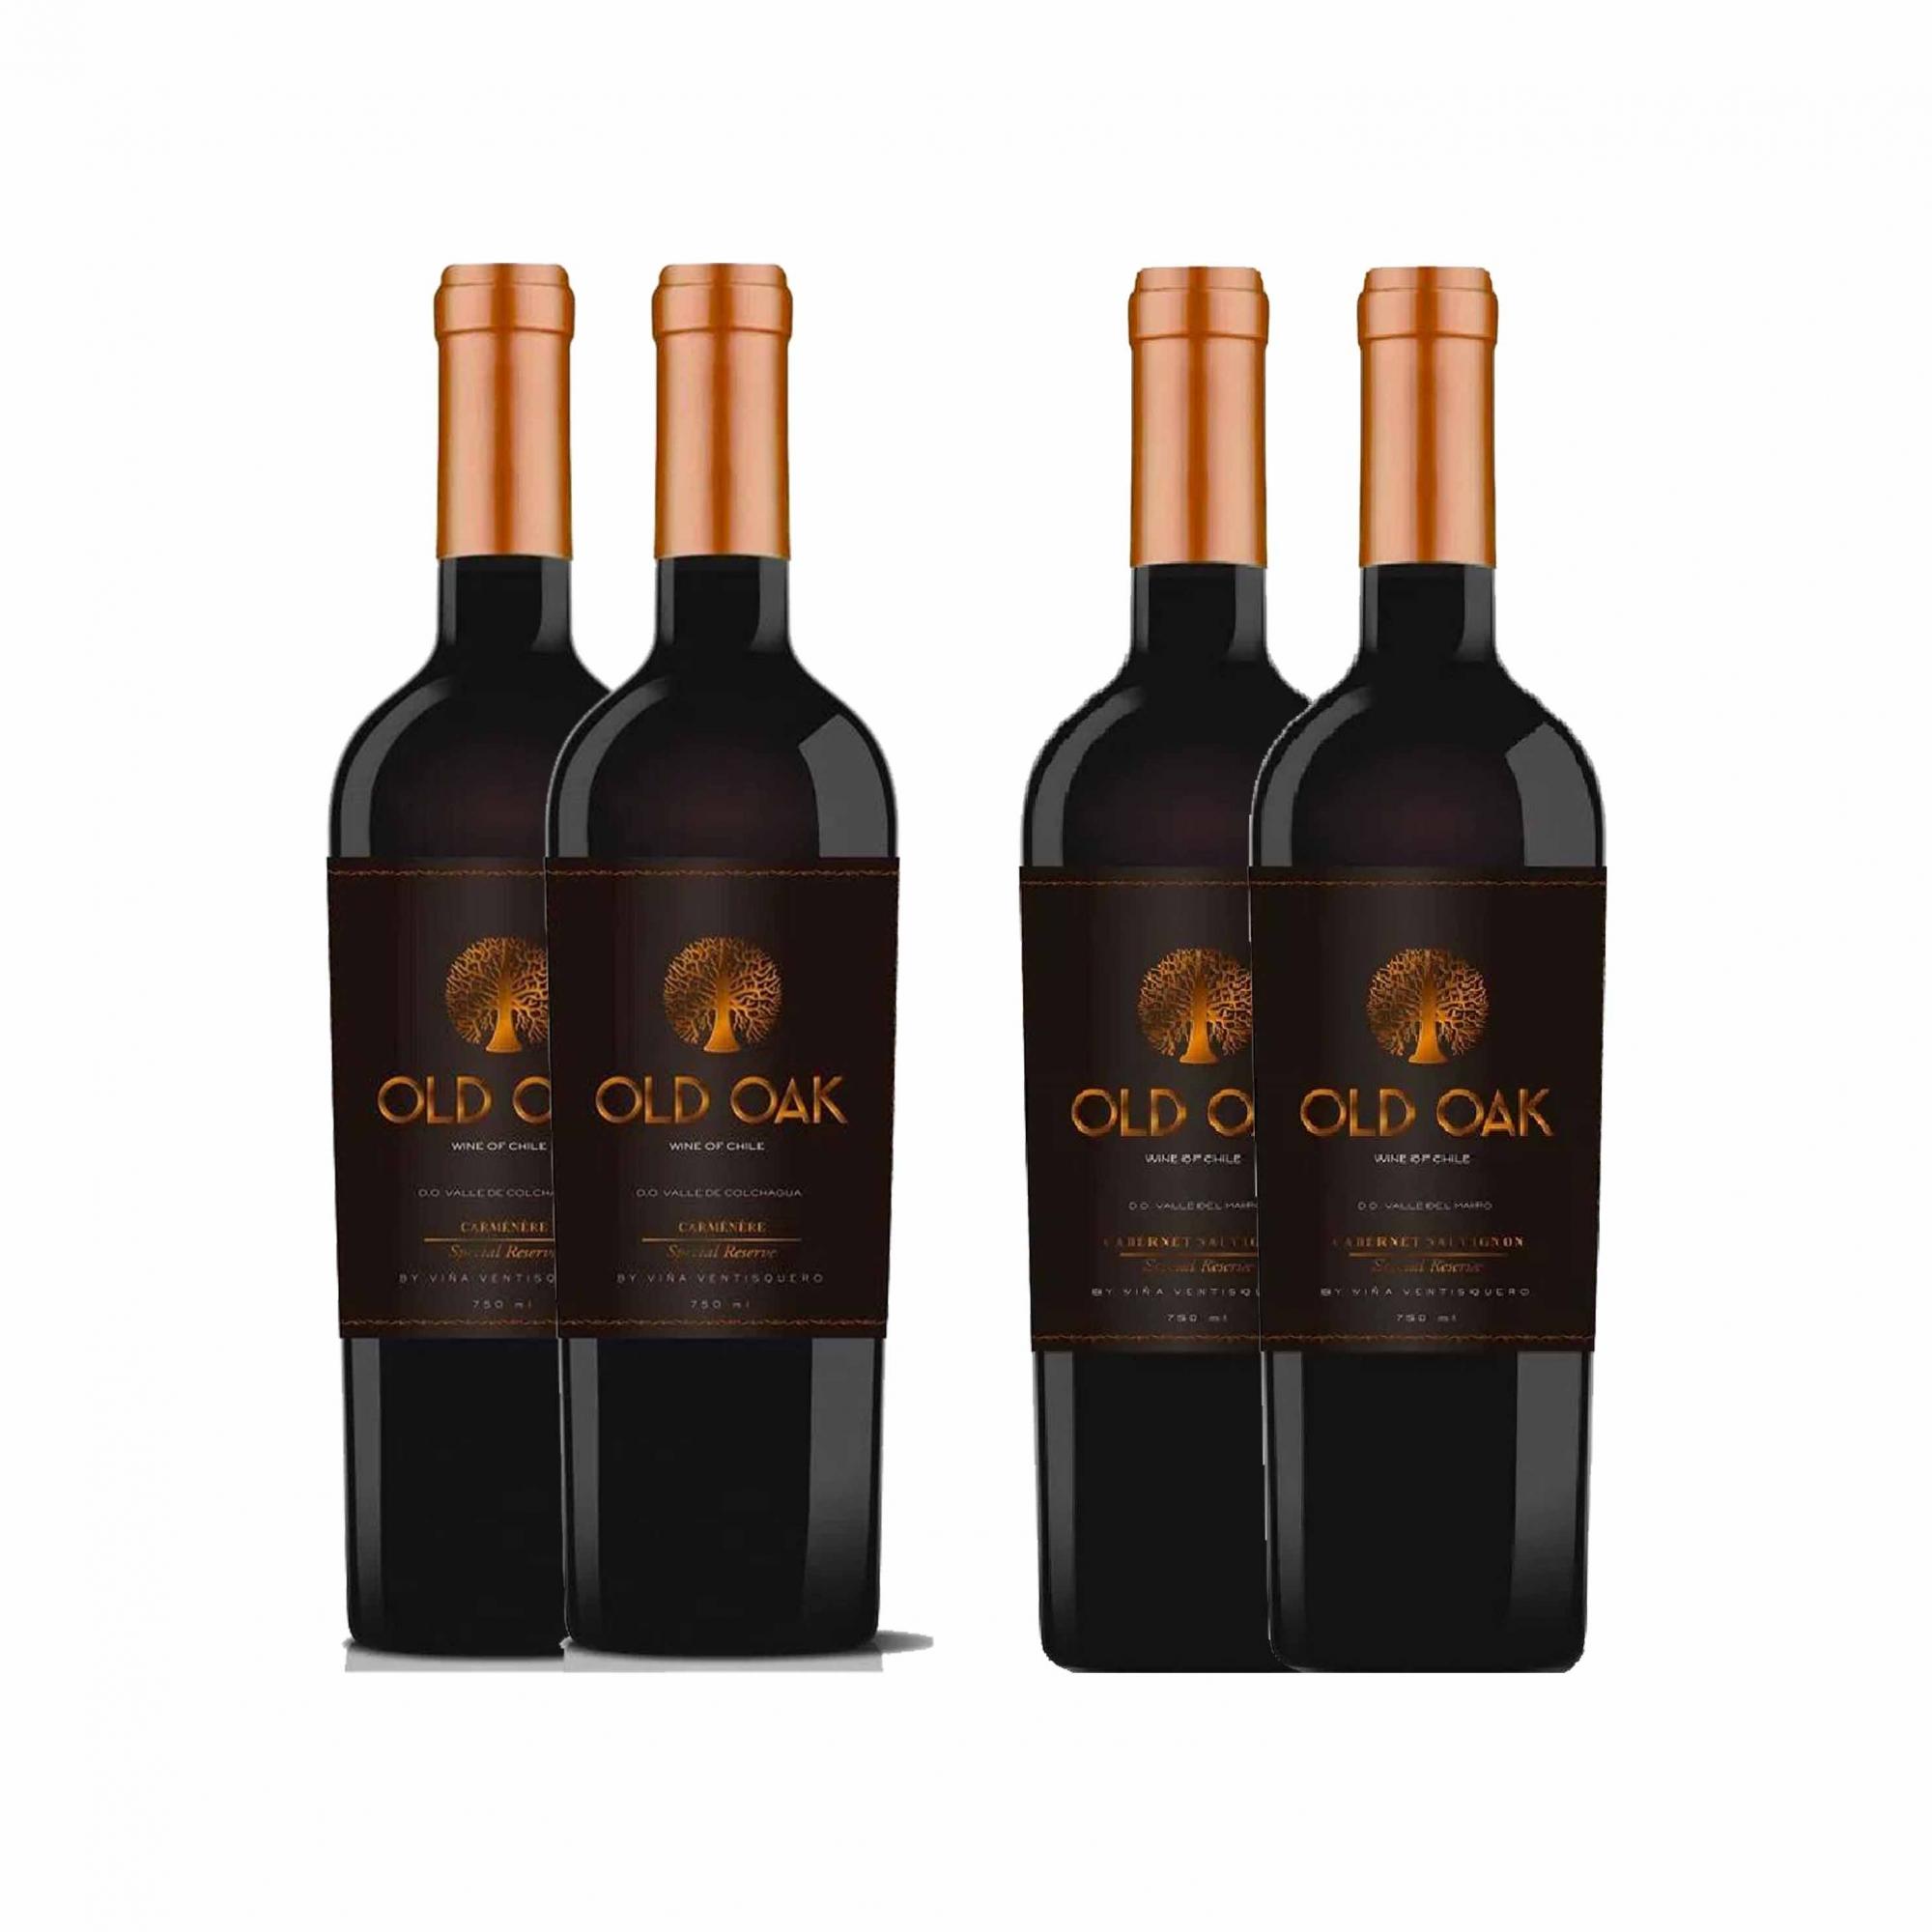 Kit 4x Vinho Tinto Chileno Old Oak Special Reserve Cabernet Sauvignon/Carmenere 2018